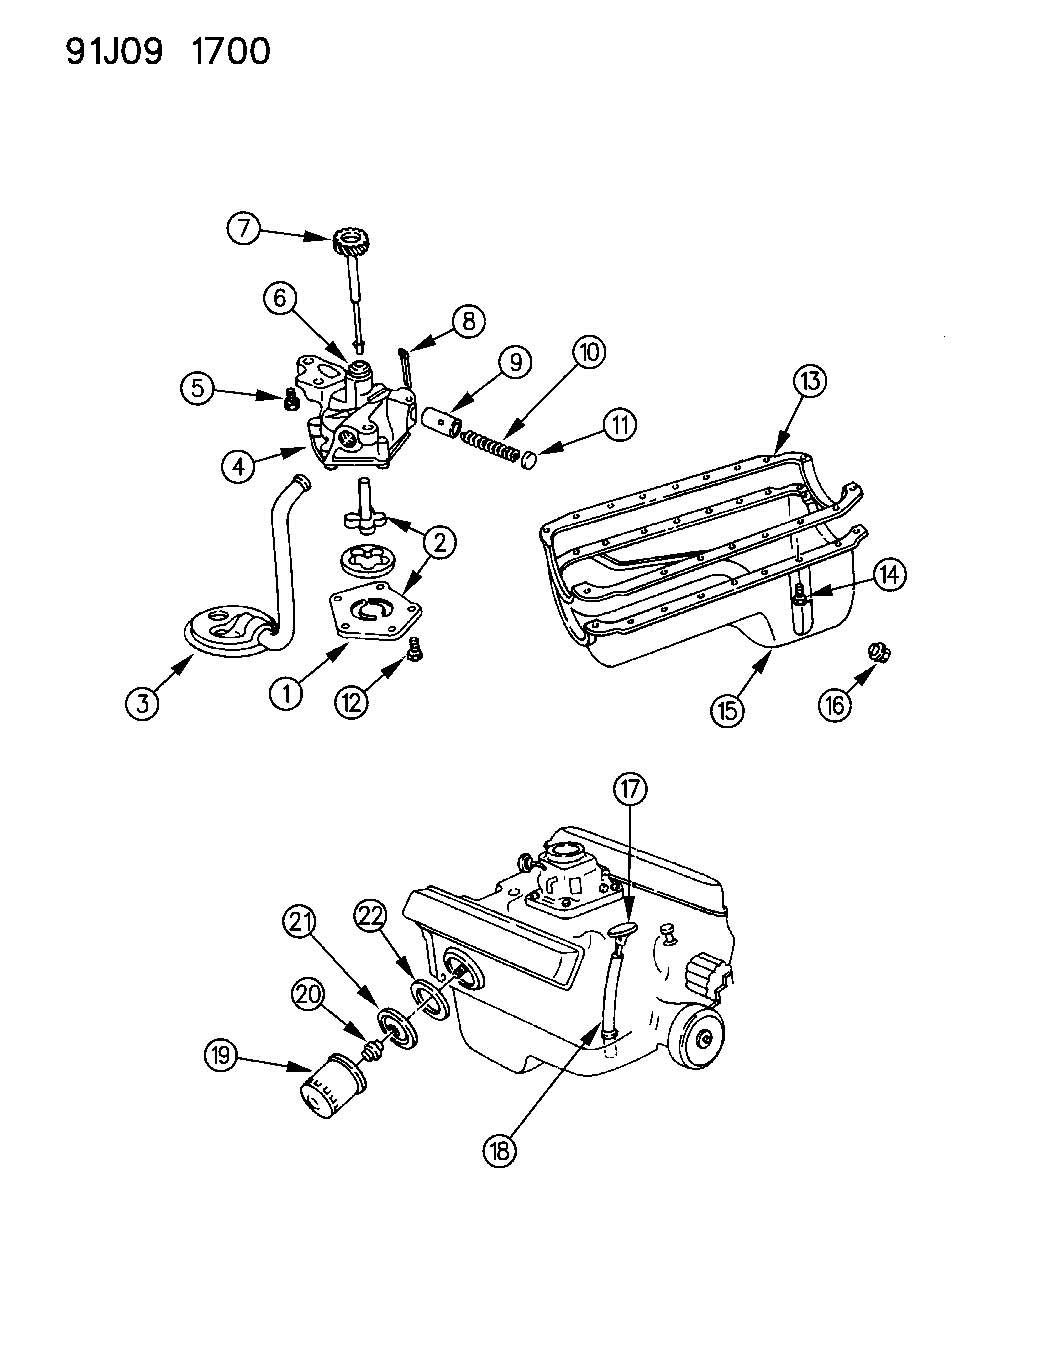 Jeep Grand Cherokee Engine Oiling 5 2l Engine Zj